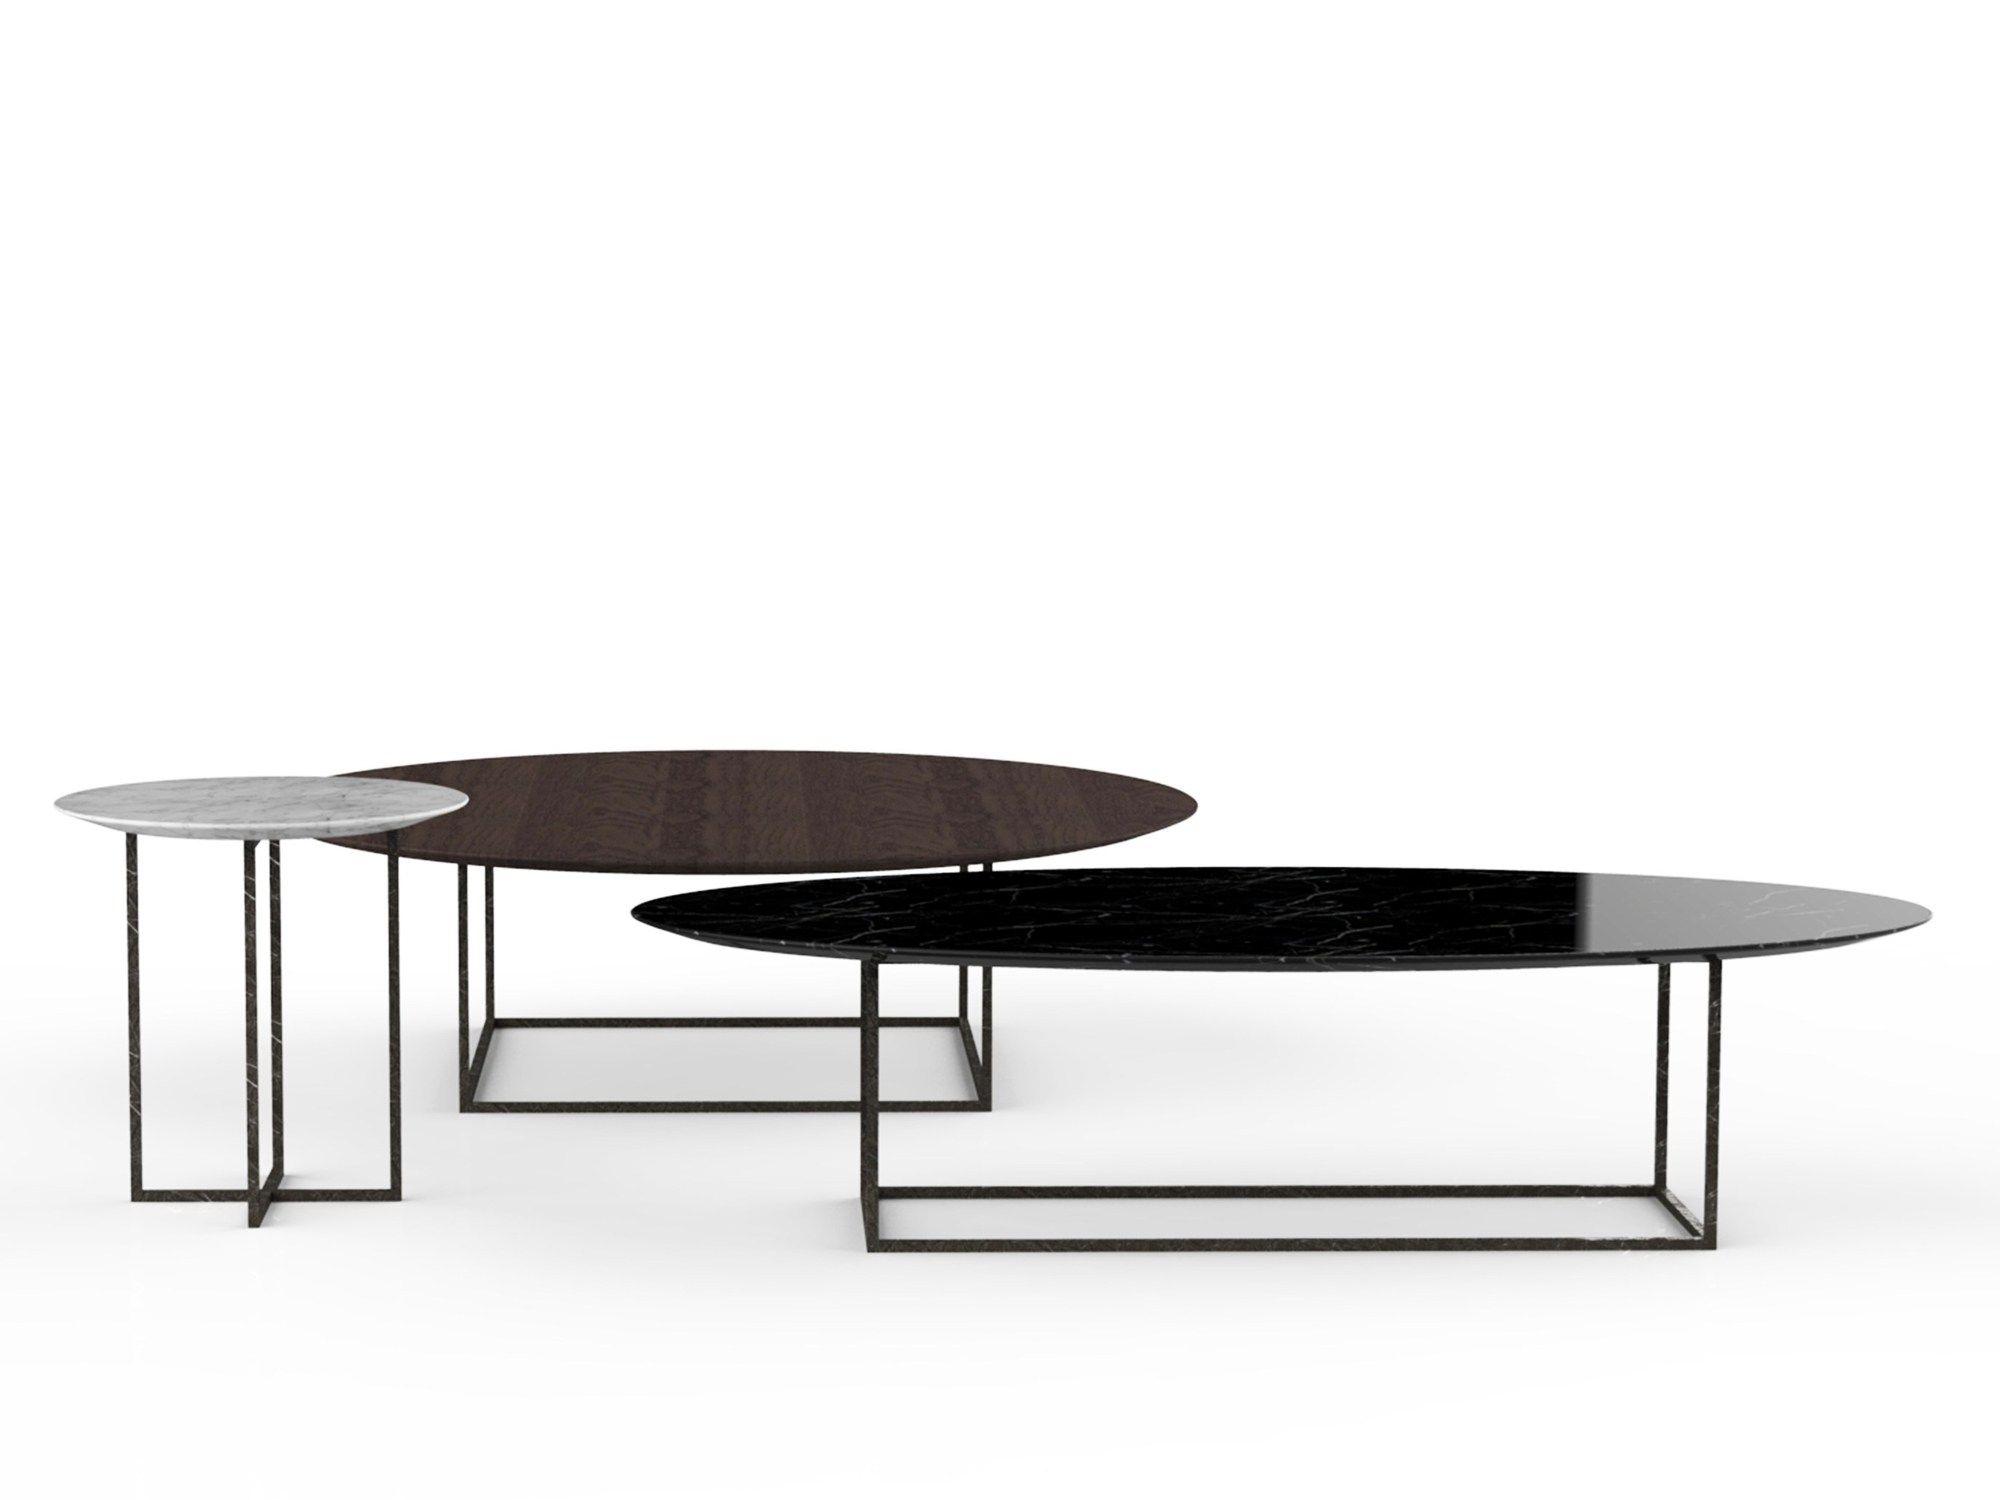 Sabi Table Basse En Marbre By Desiree Design Setsu Shinobu Ito Table Basse Marbre Table Basse Table Marbre